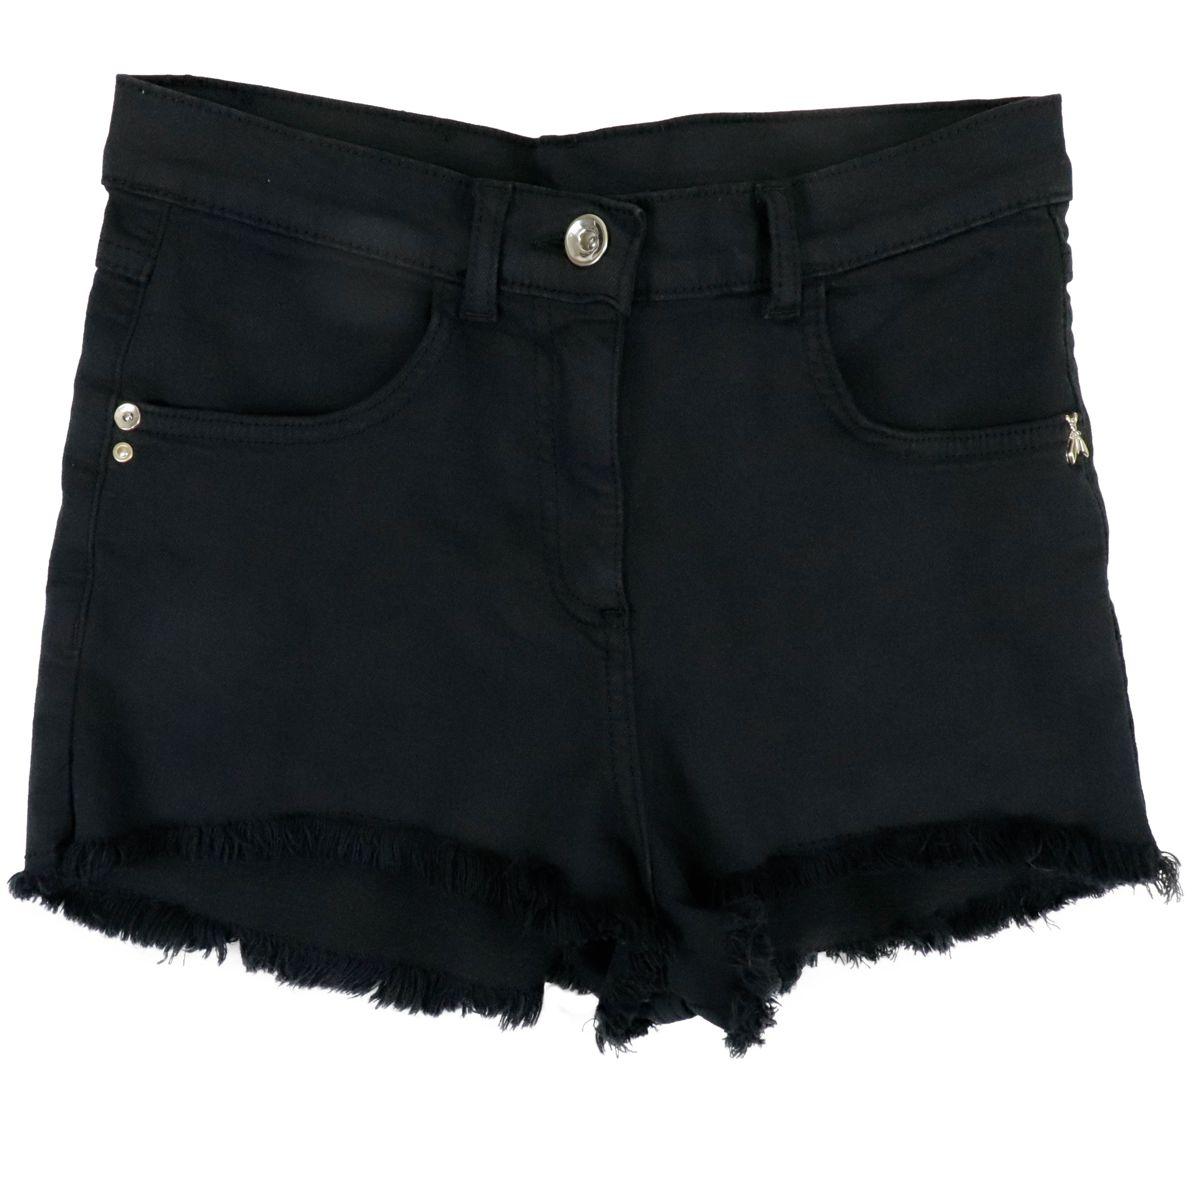 1. Patrizia Pepe shorts in denim effect cotton blend Black Patrizia Pepe